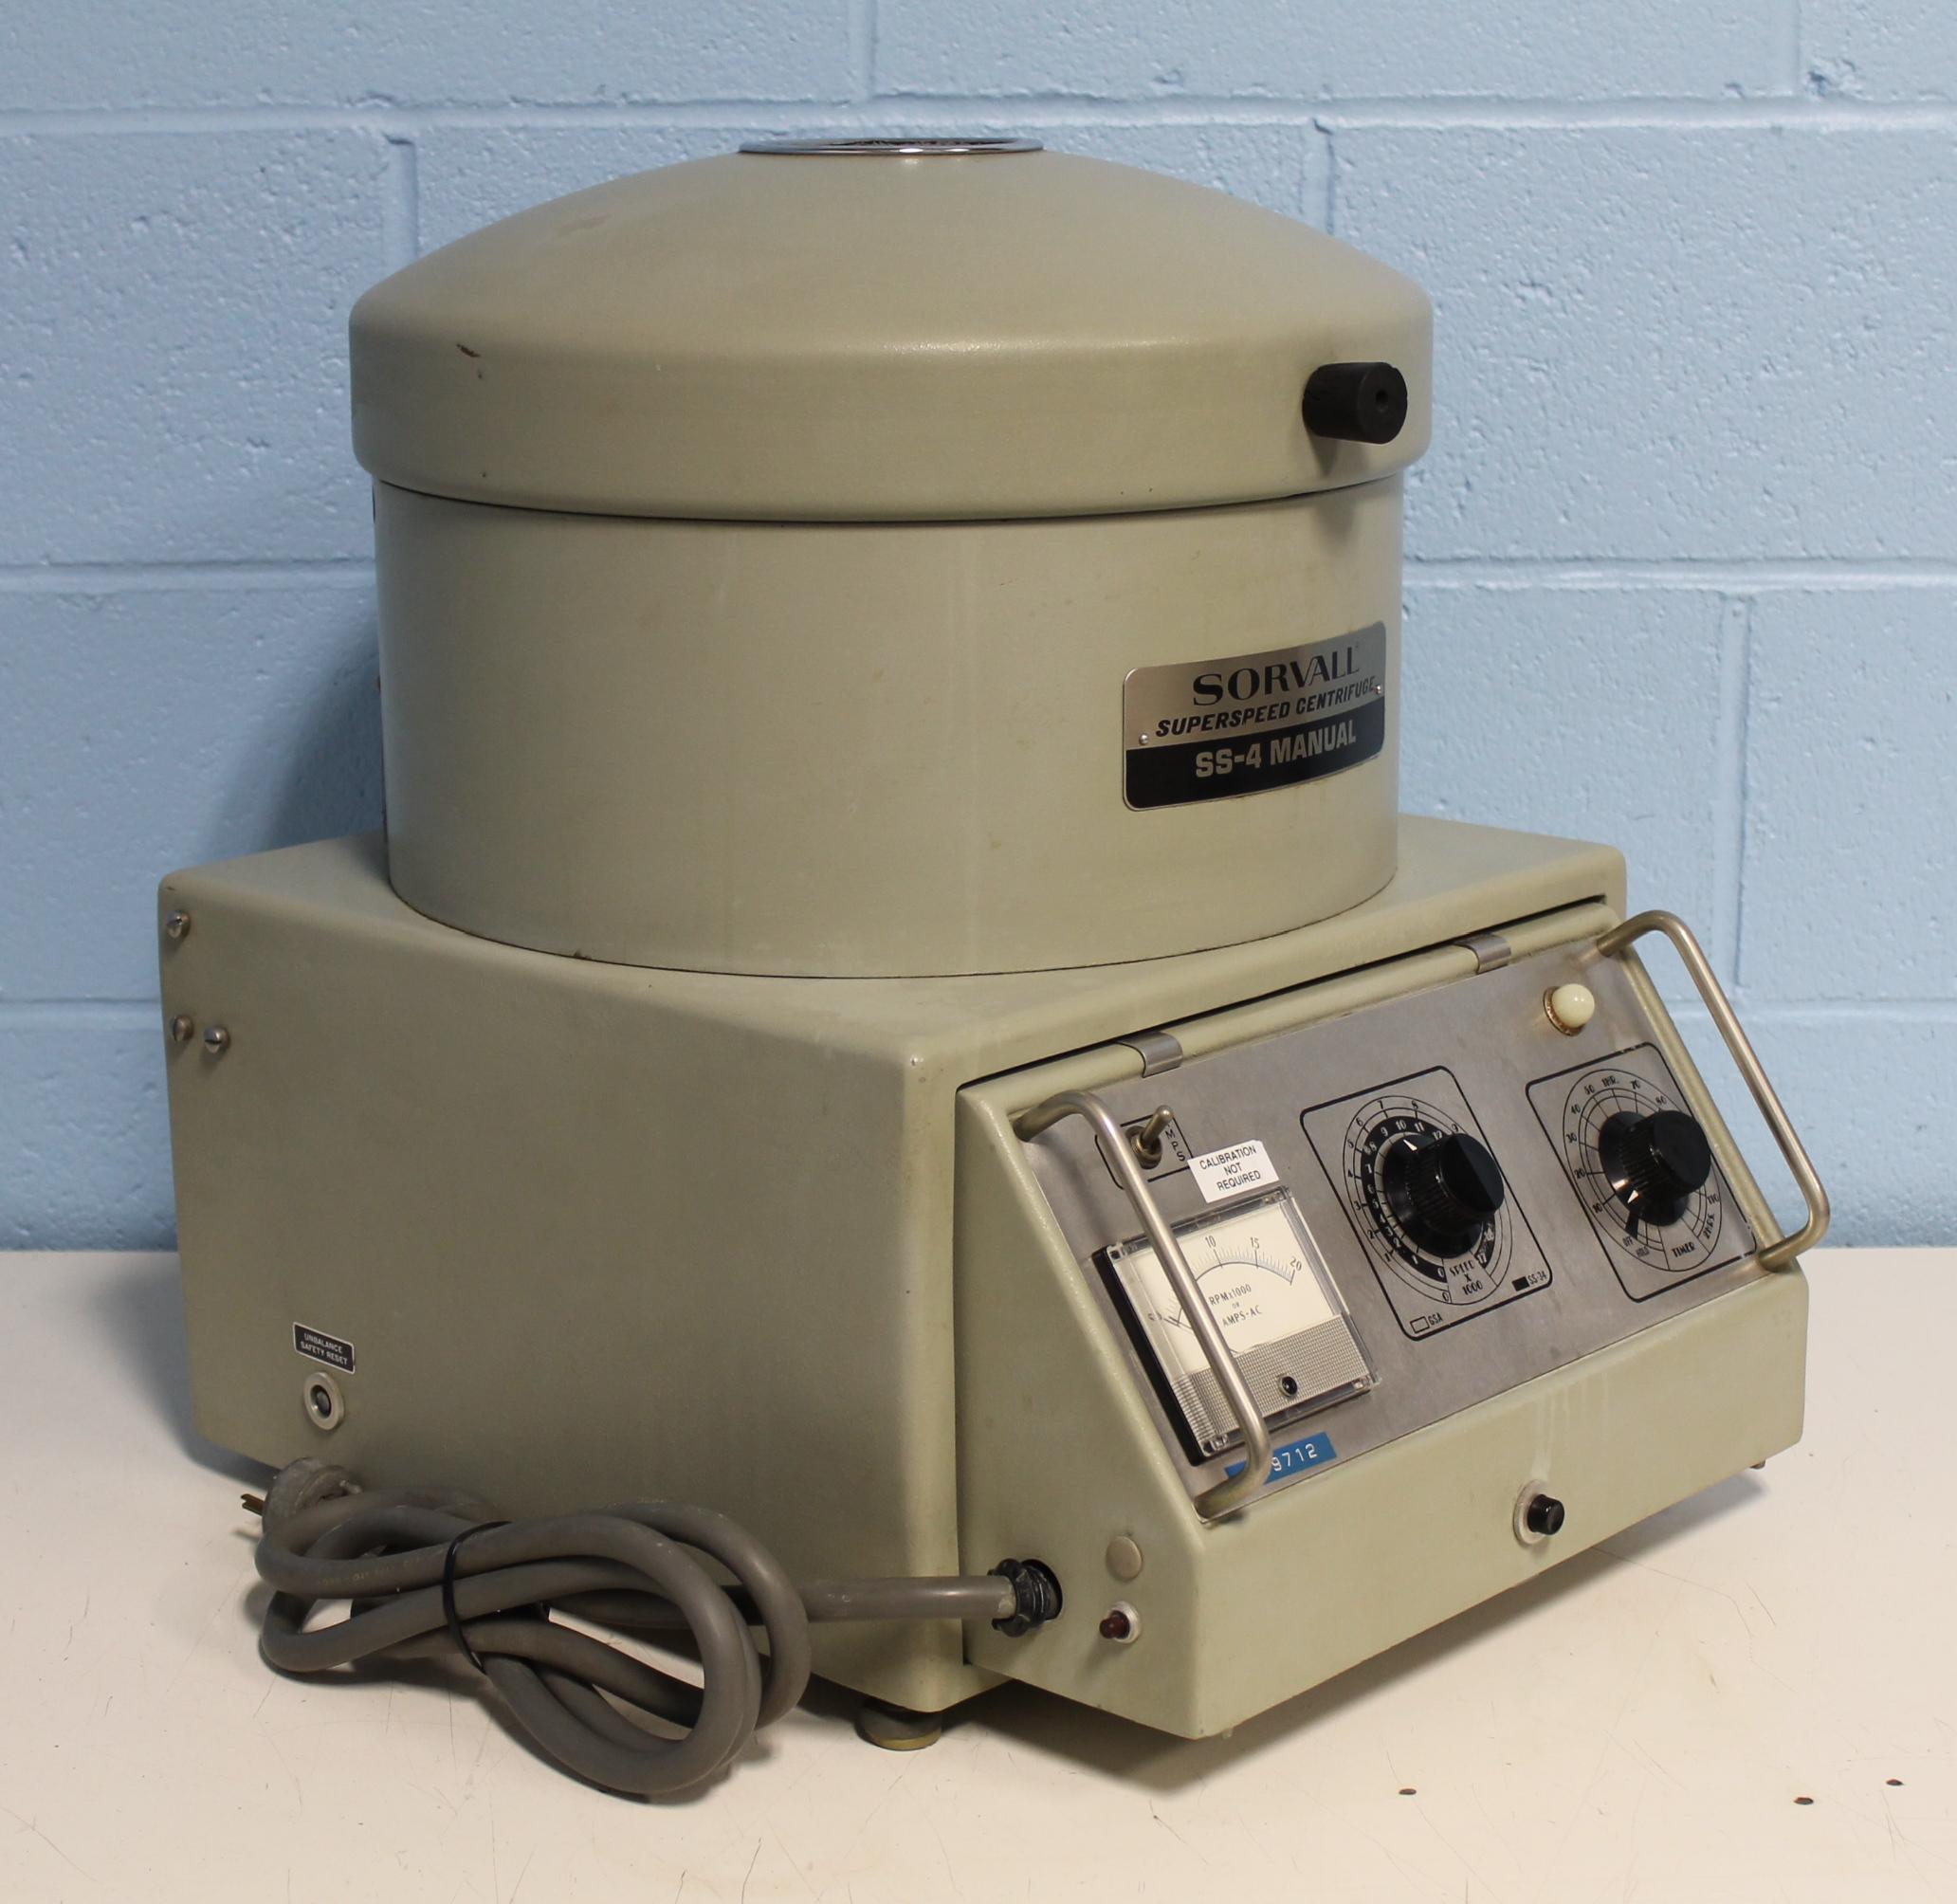 Sorvall Superspeed Centrifuge Model SS-4 Manual Image ...